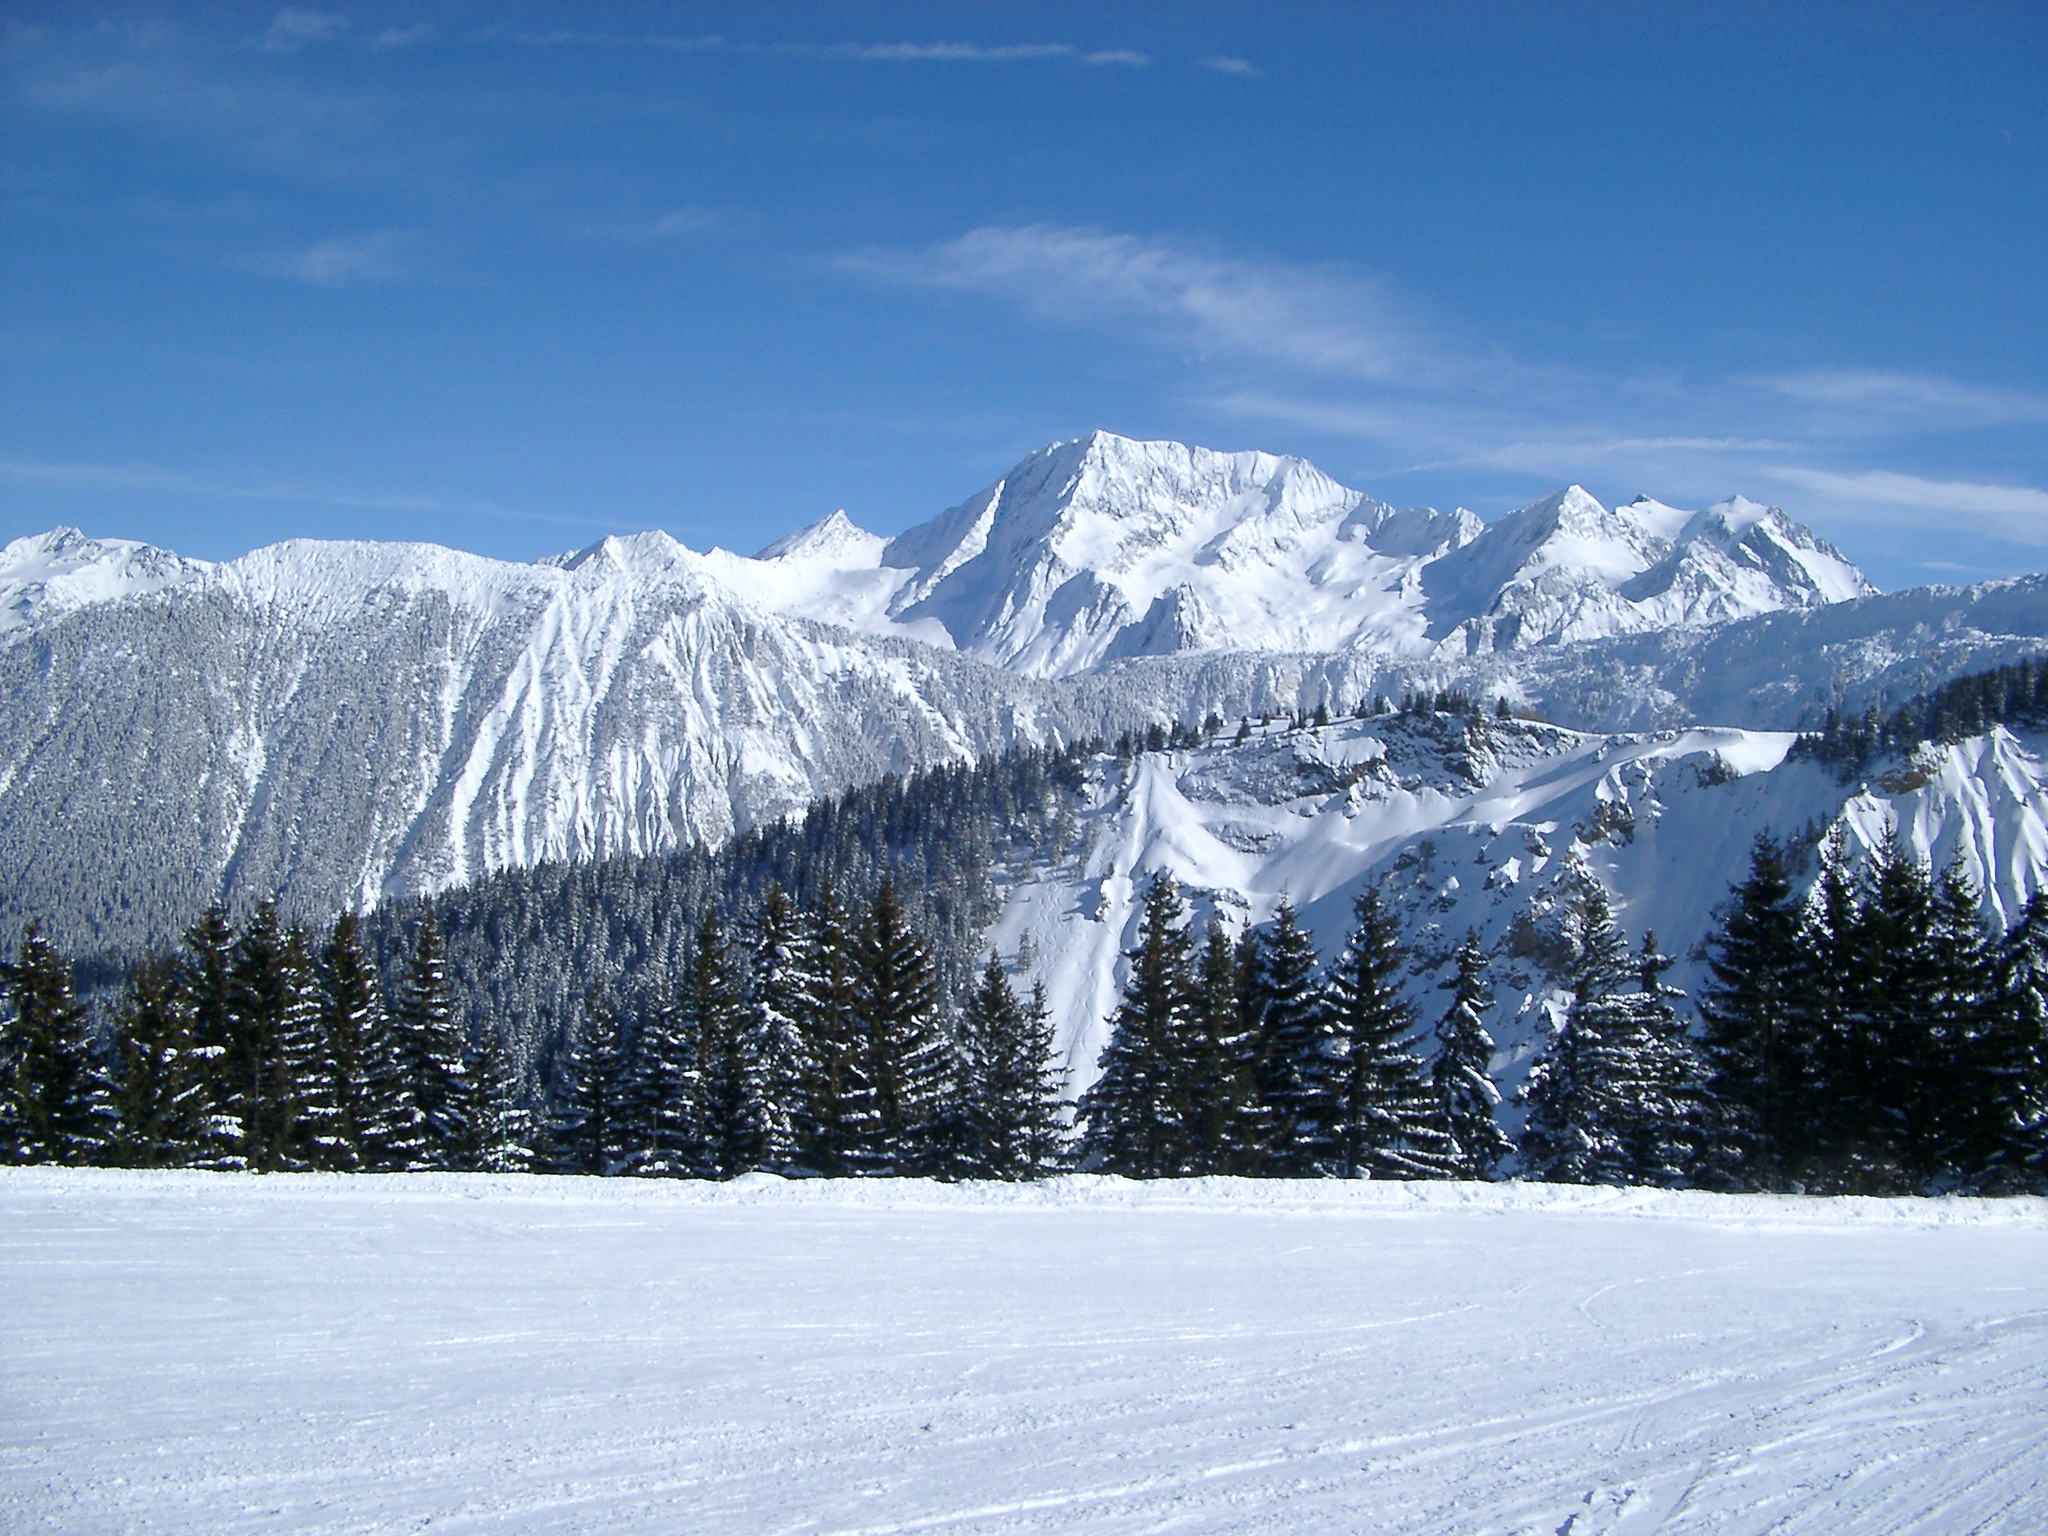 Mountain Snow Scene Winter Snow Wallpapers 2048x1536